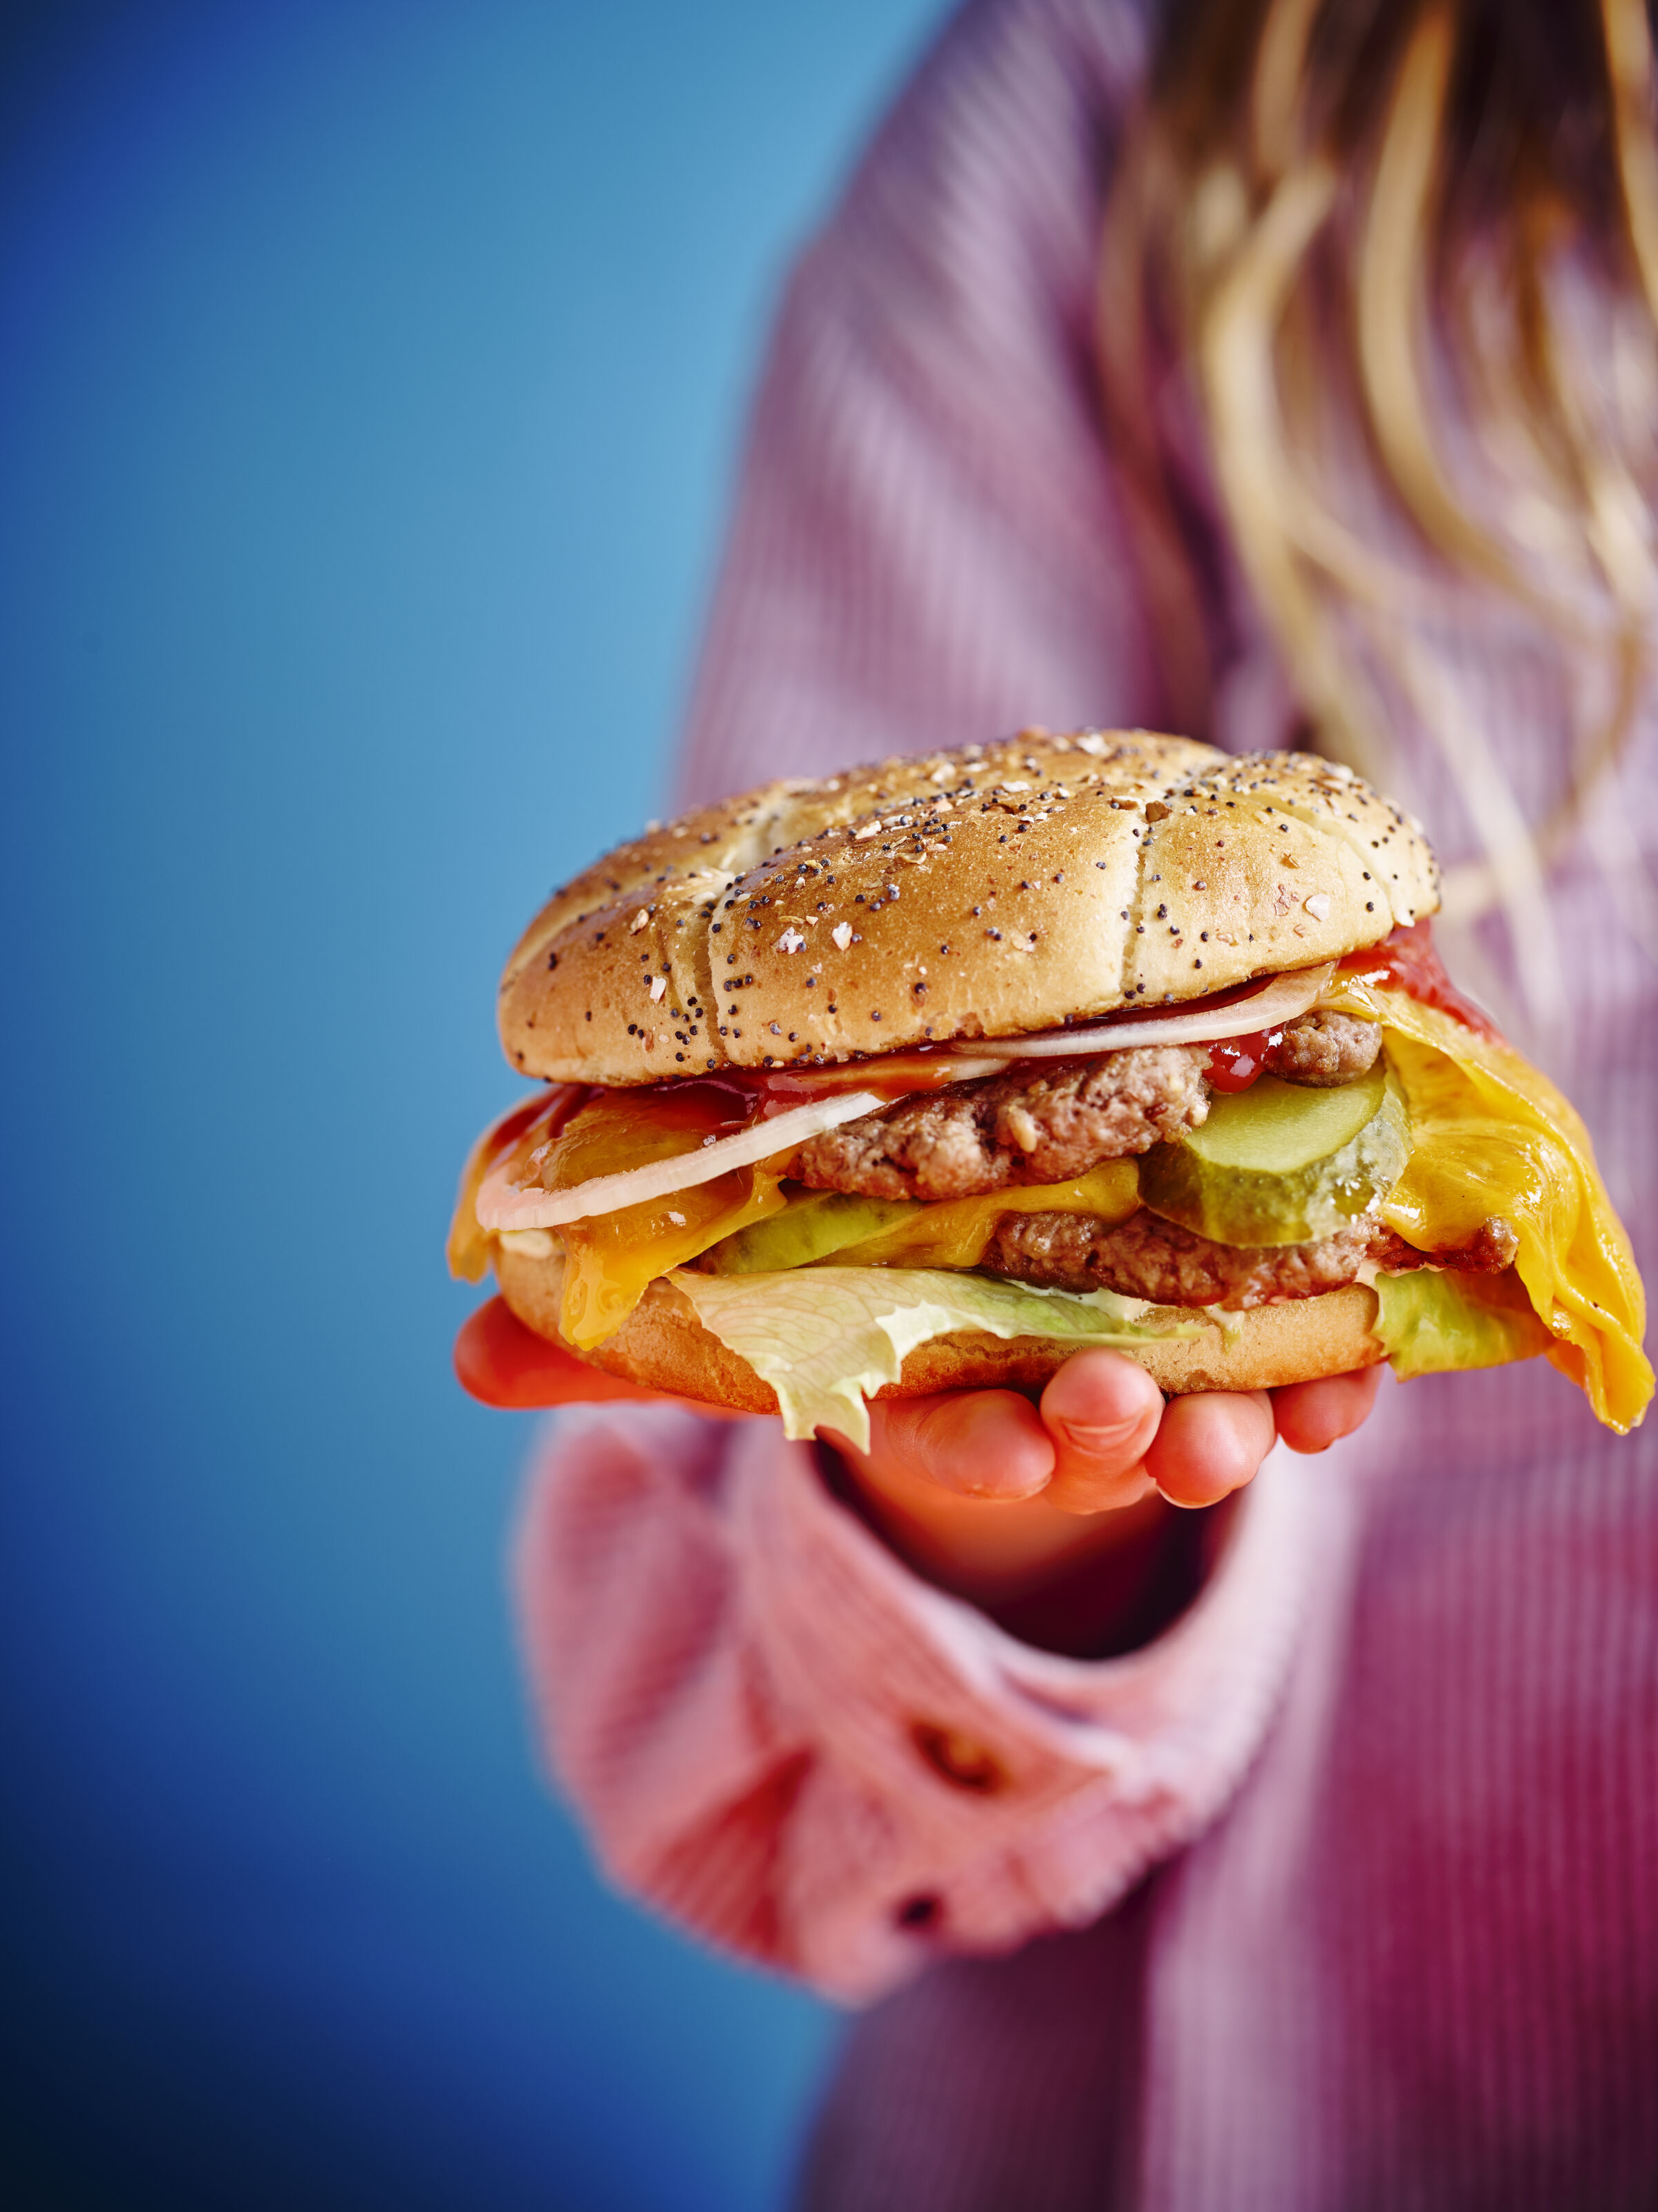 SOFIE DUMONT 22-01 cheeseburger 144722